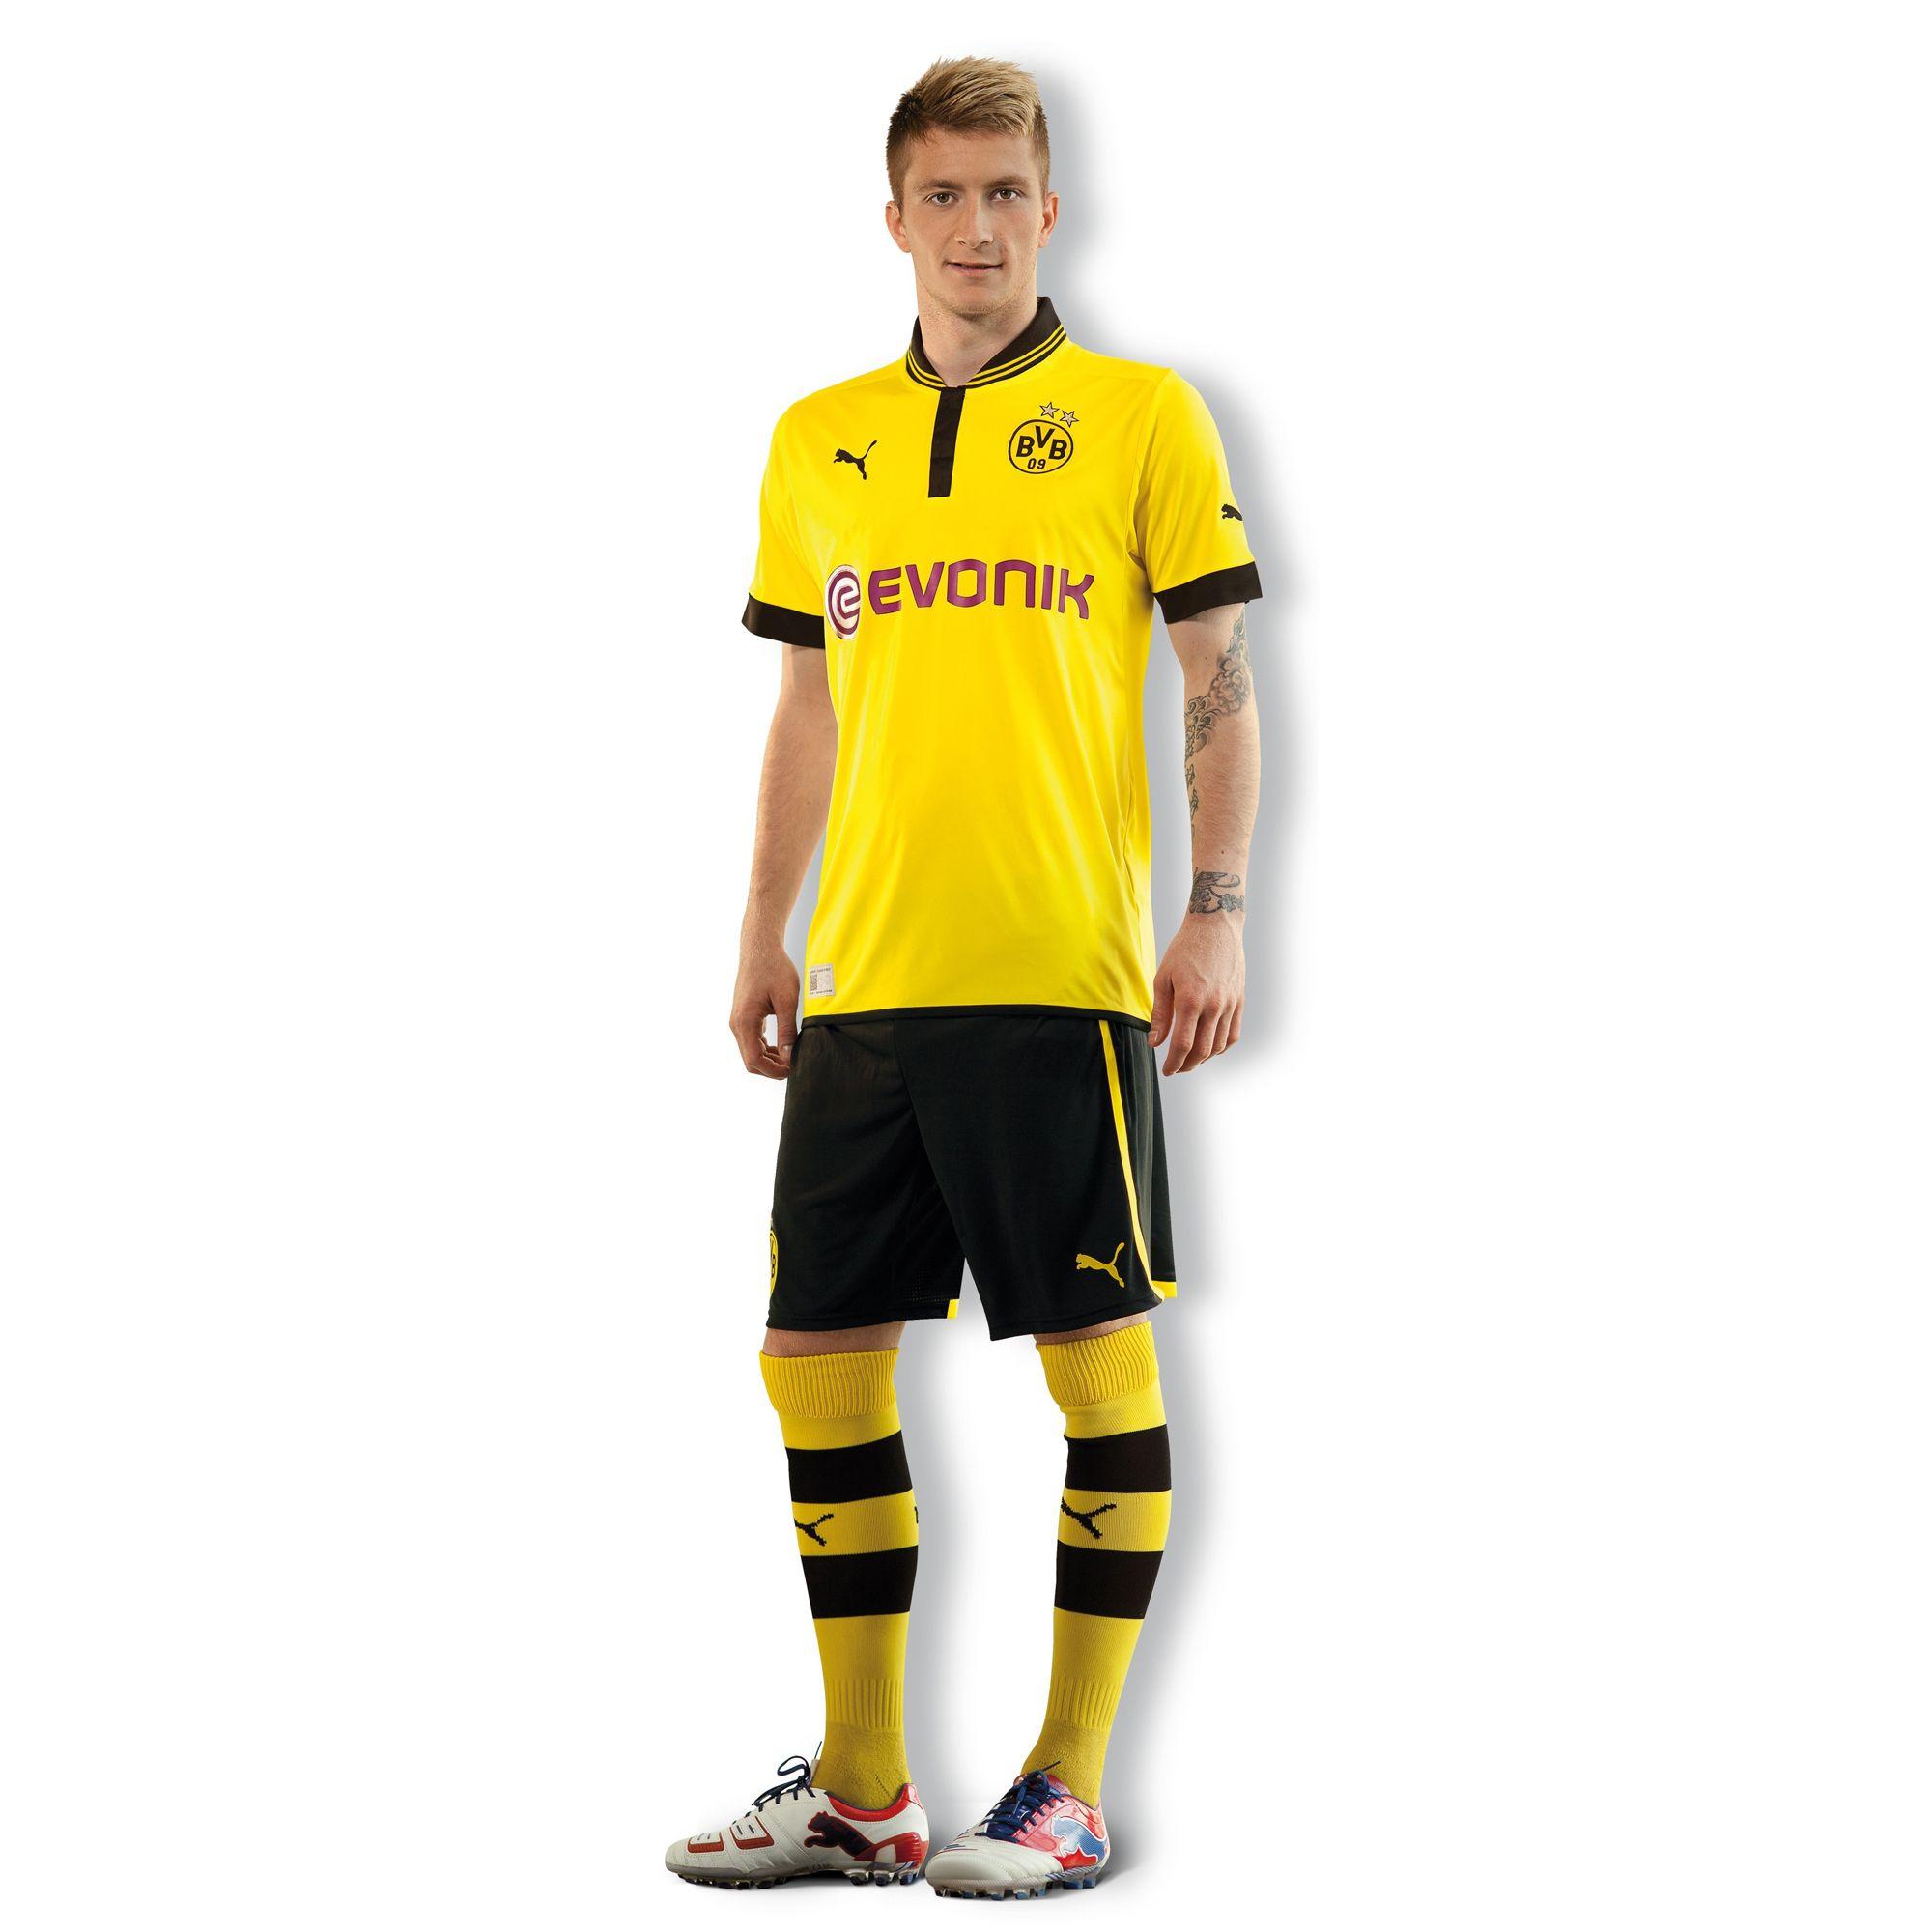 Borussia Dortmund Marco Reus